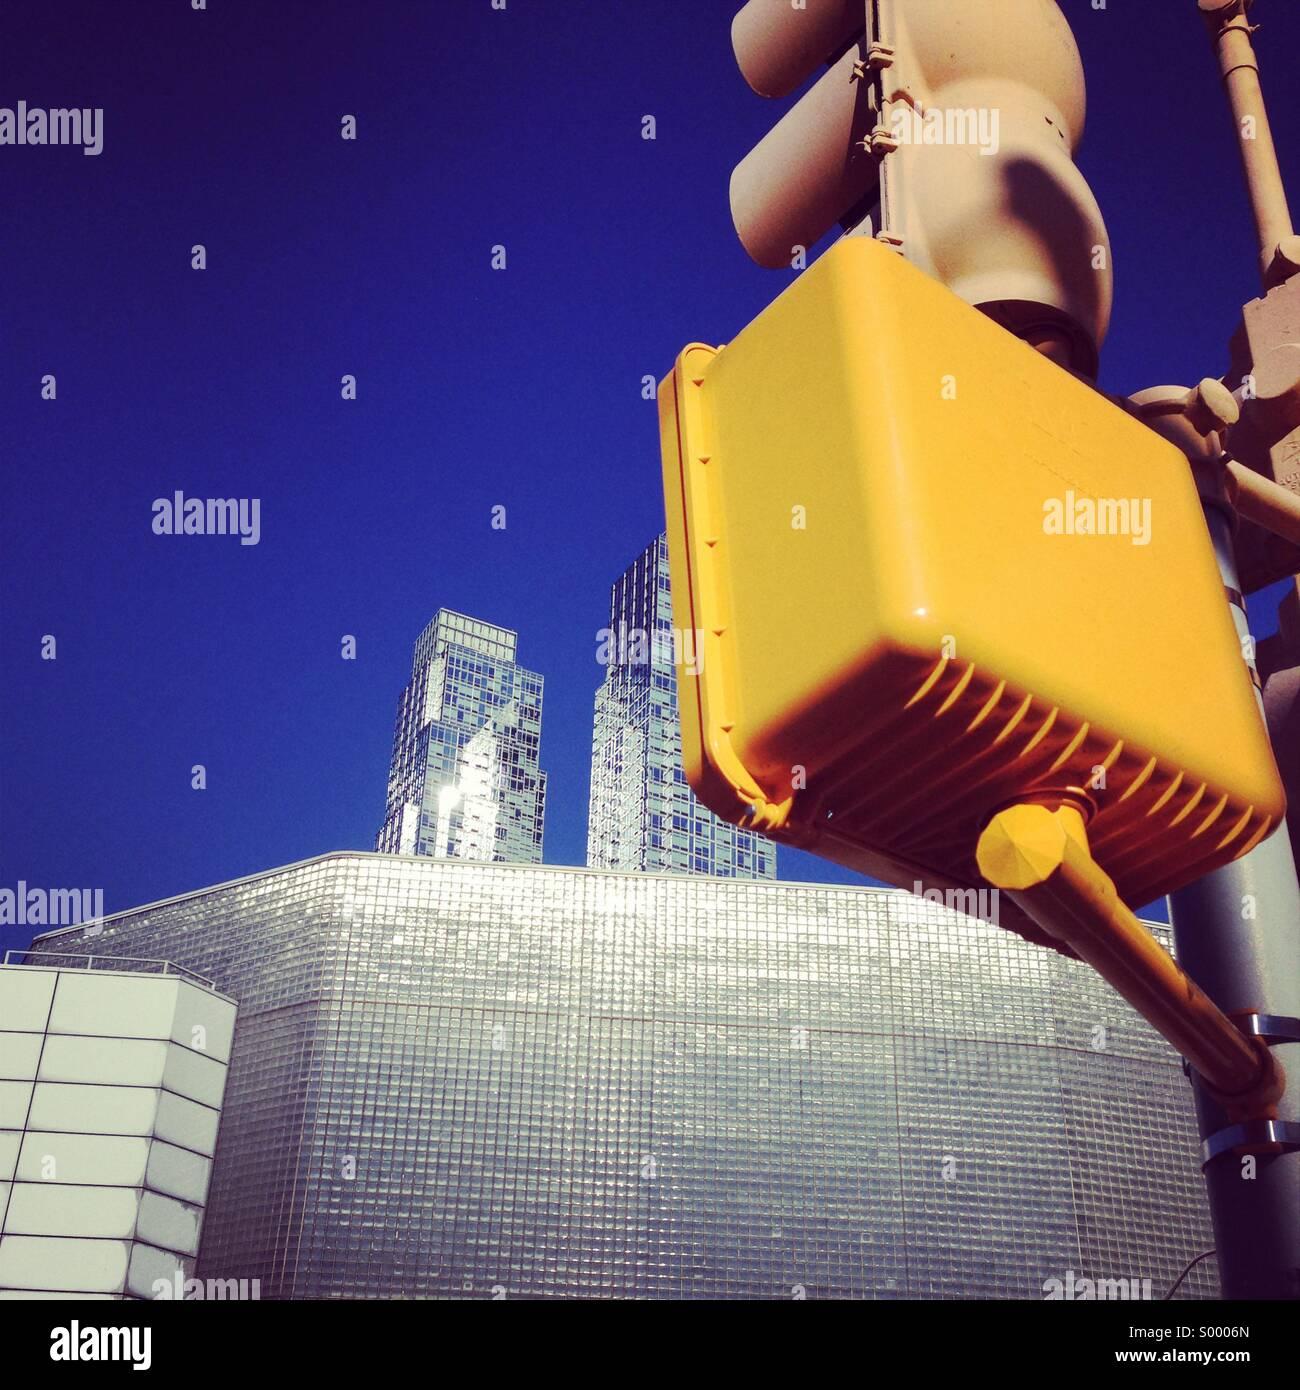 New York City street scene - Stock Image